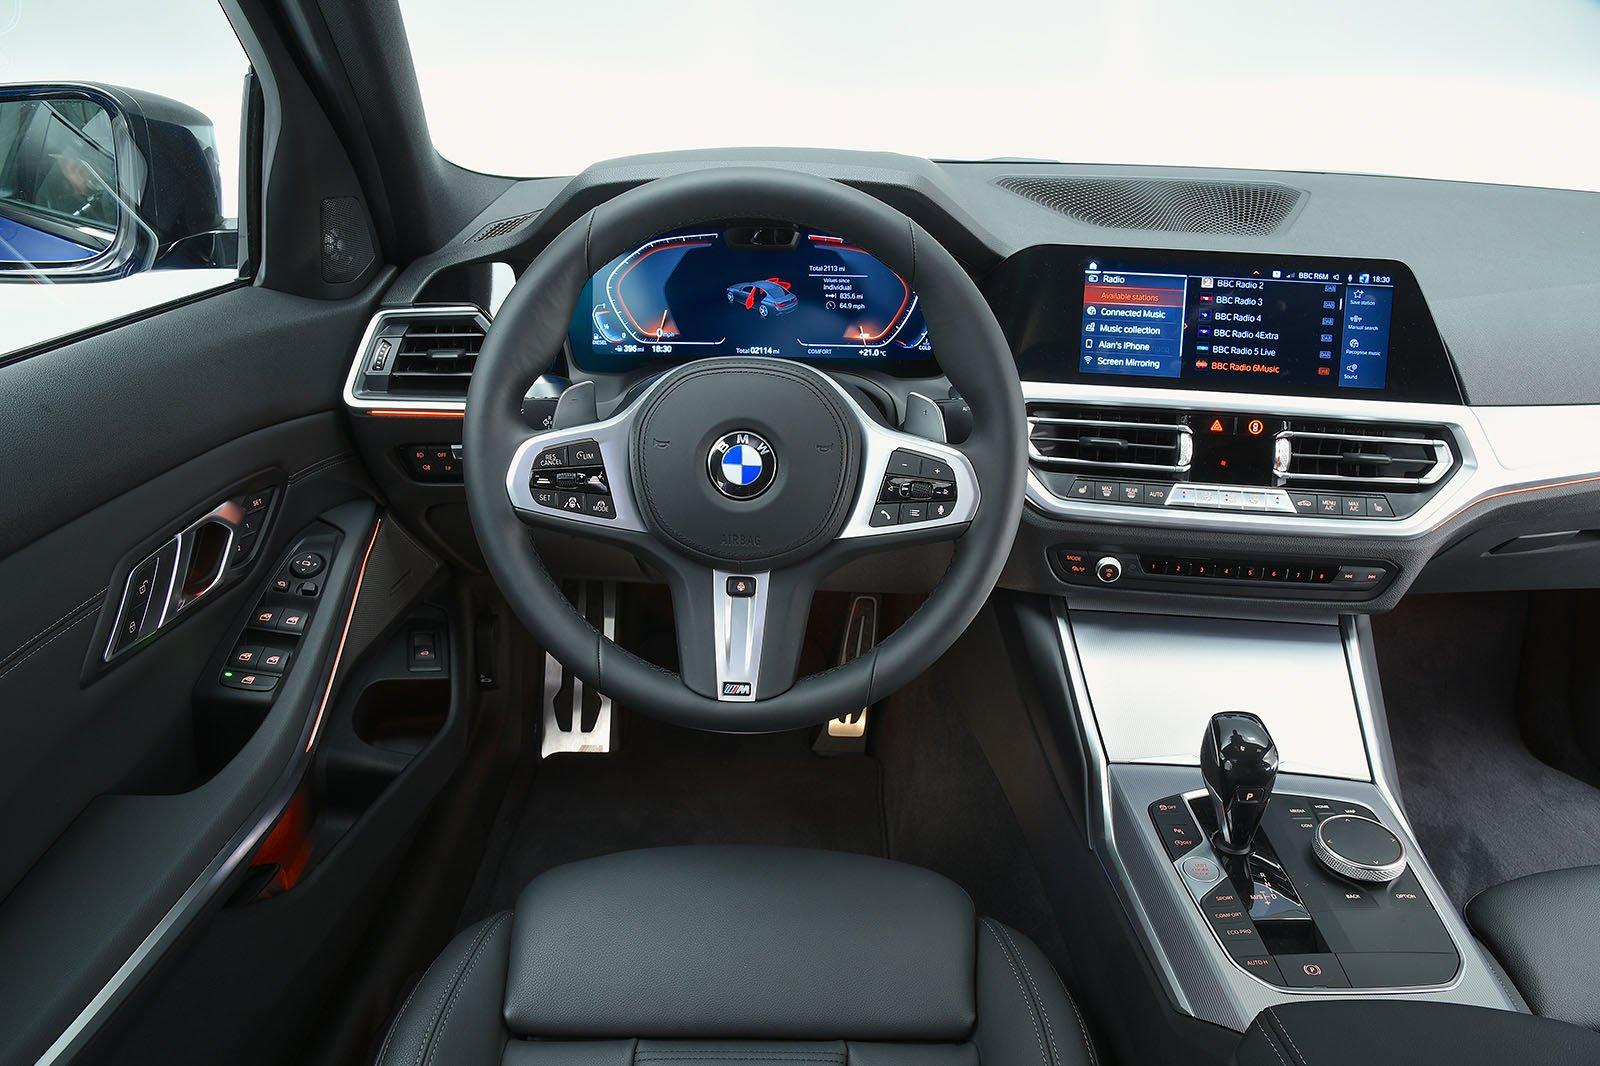 Bmw 3 Series Interior Sat Nav Dashboard What Car